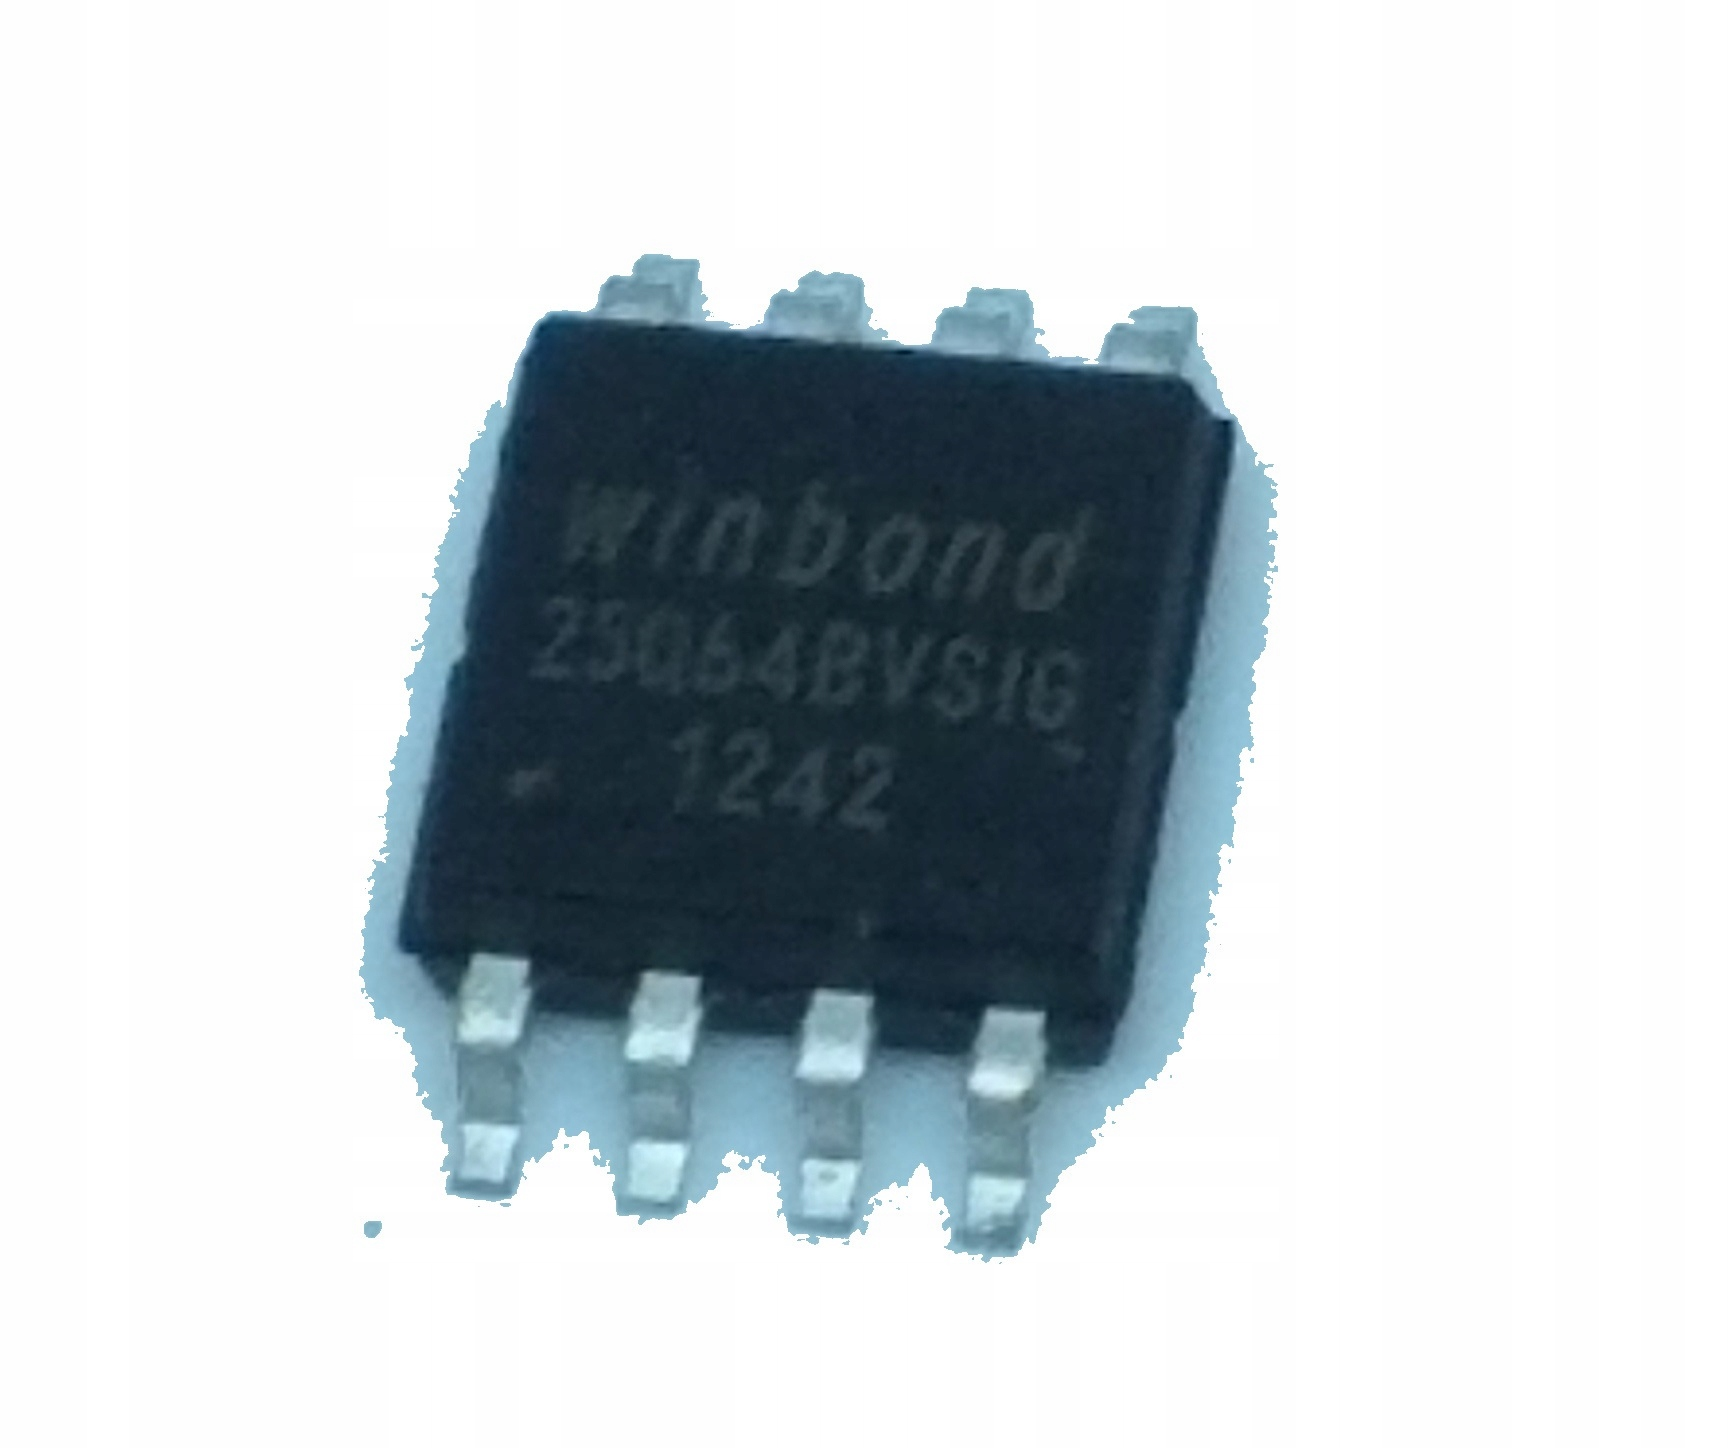 W25q64 Winbond